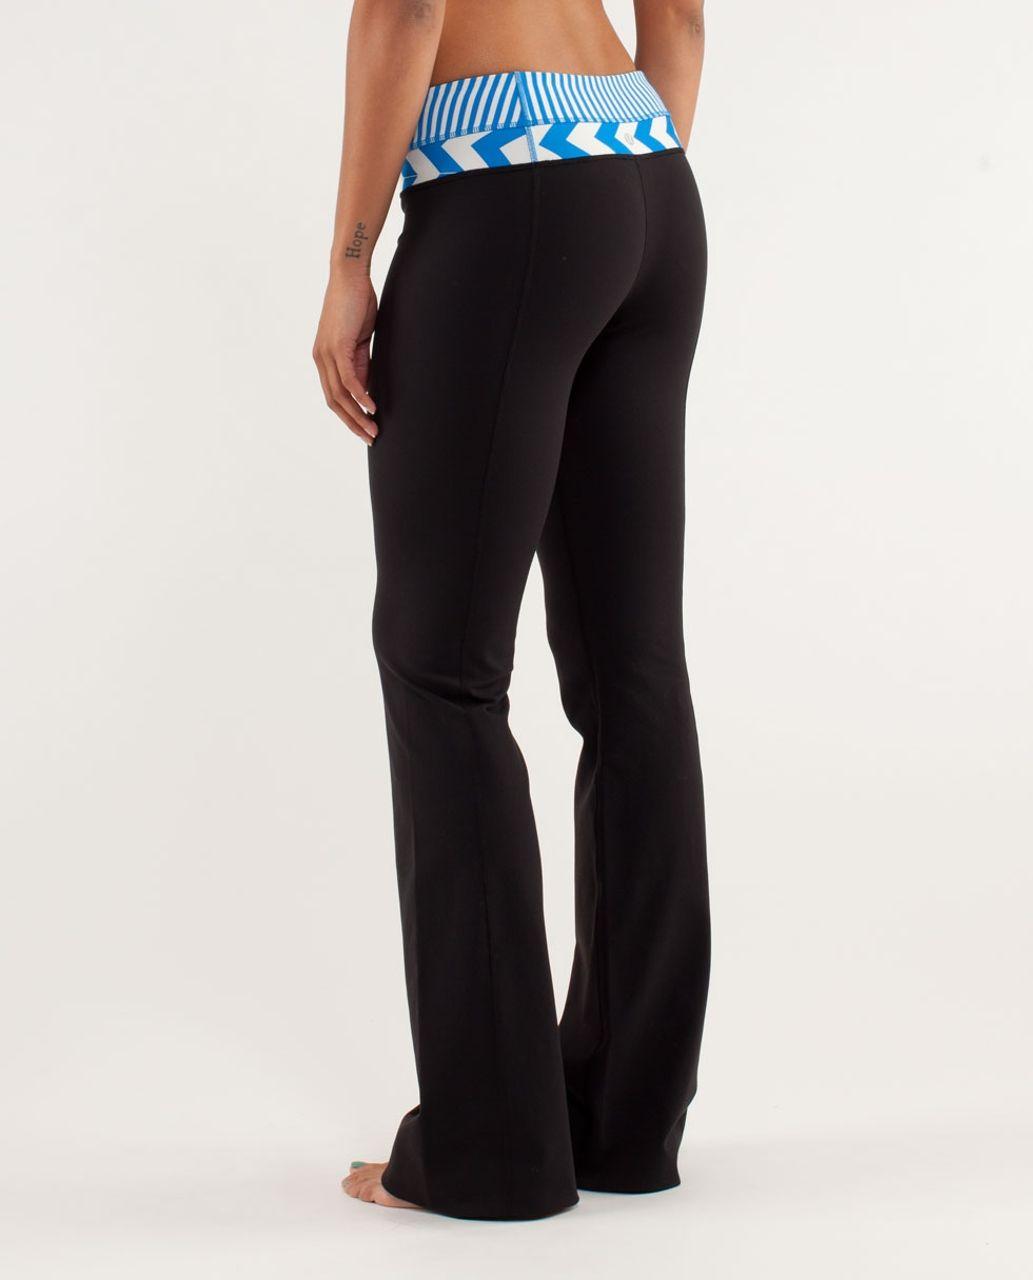 Lululemon Groove Pant *Slim (Regular) - Black / Classic Stripe Polar Cream Beaming Blue / Arrow Chevron Heathered Polar Cream Blu